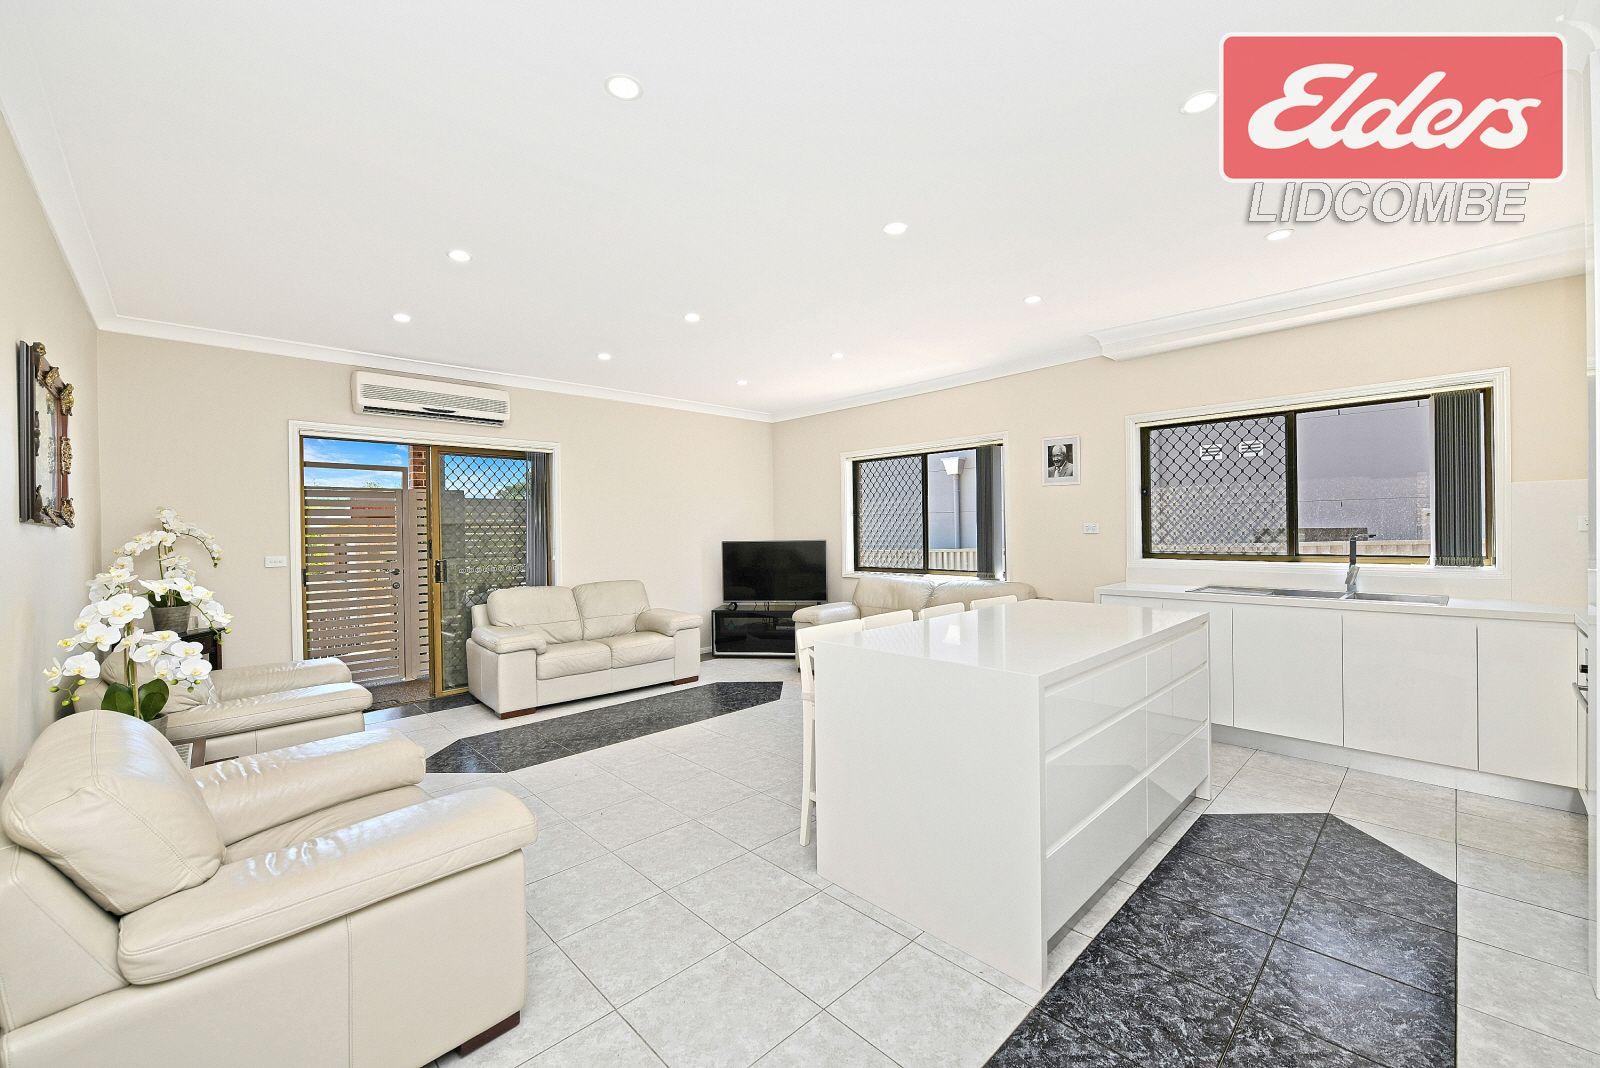 23 OSTEND STREET, Lidcombe NSW 2141, Image 1